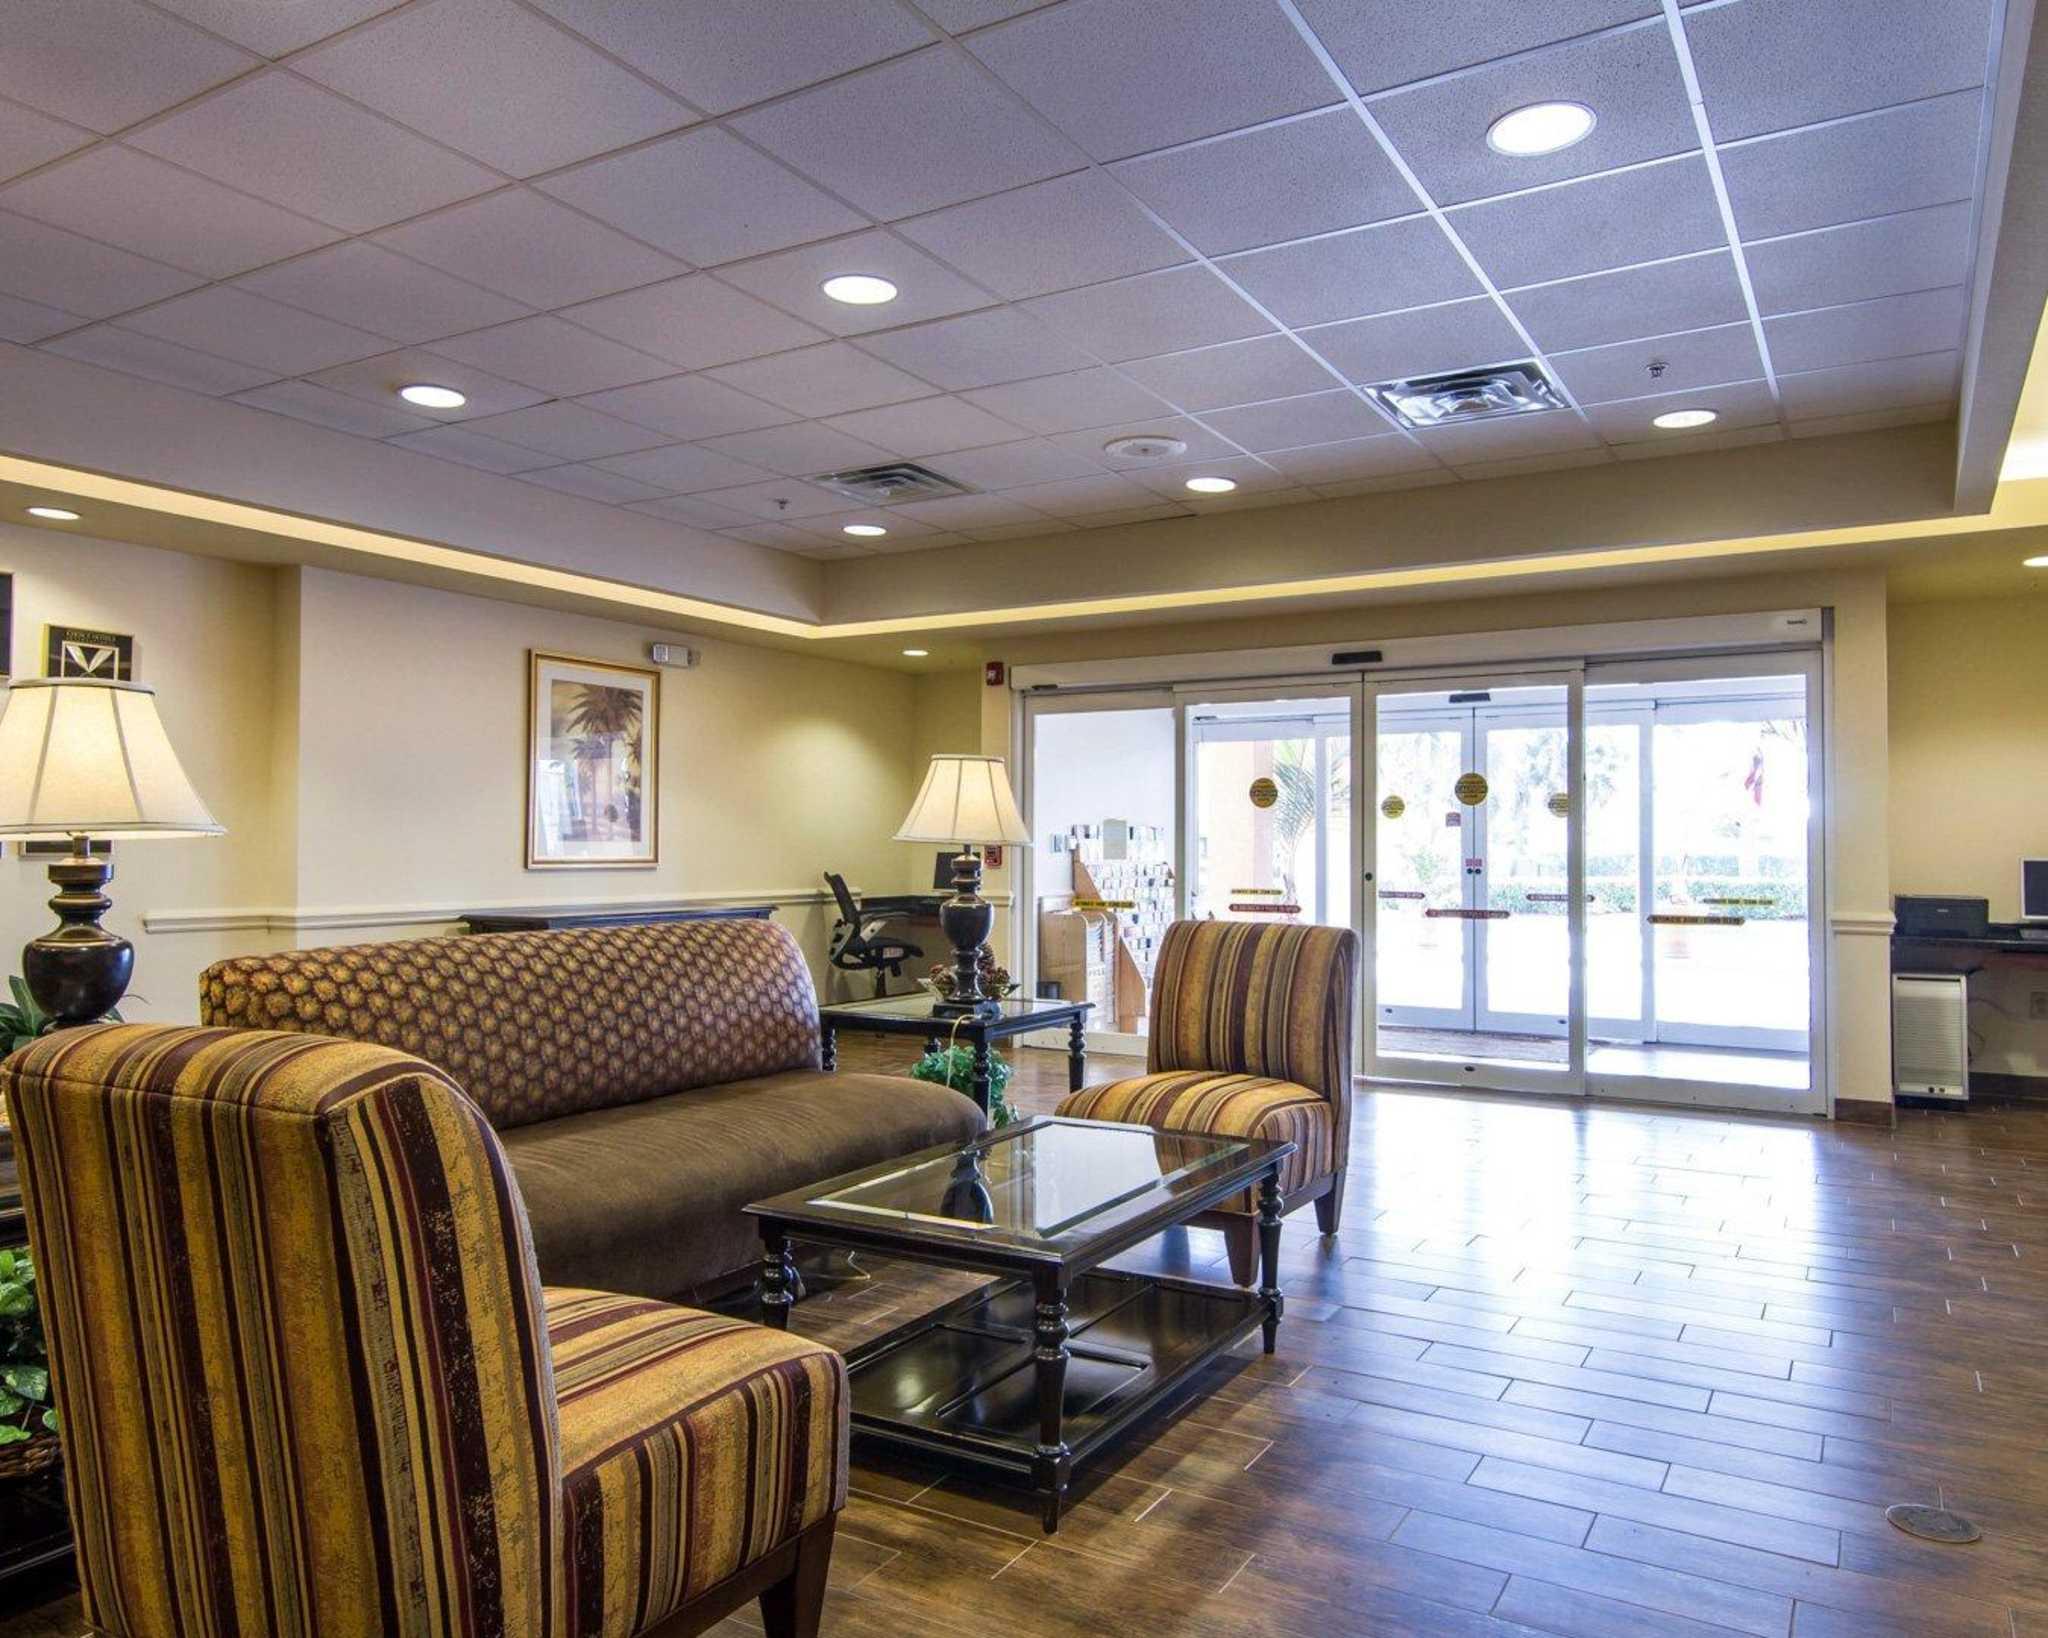 Comfort Inn & Suites Airport image 14